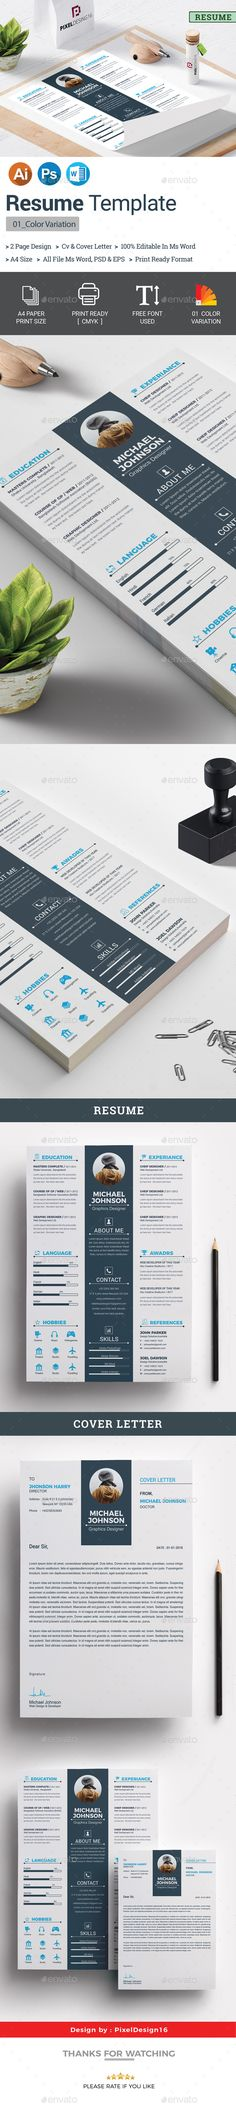 Resume Pinterest Template Resume